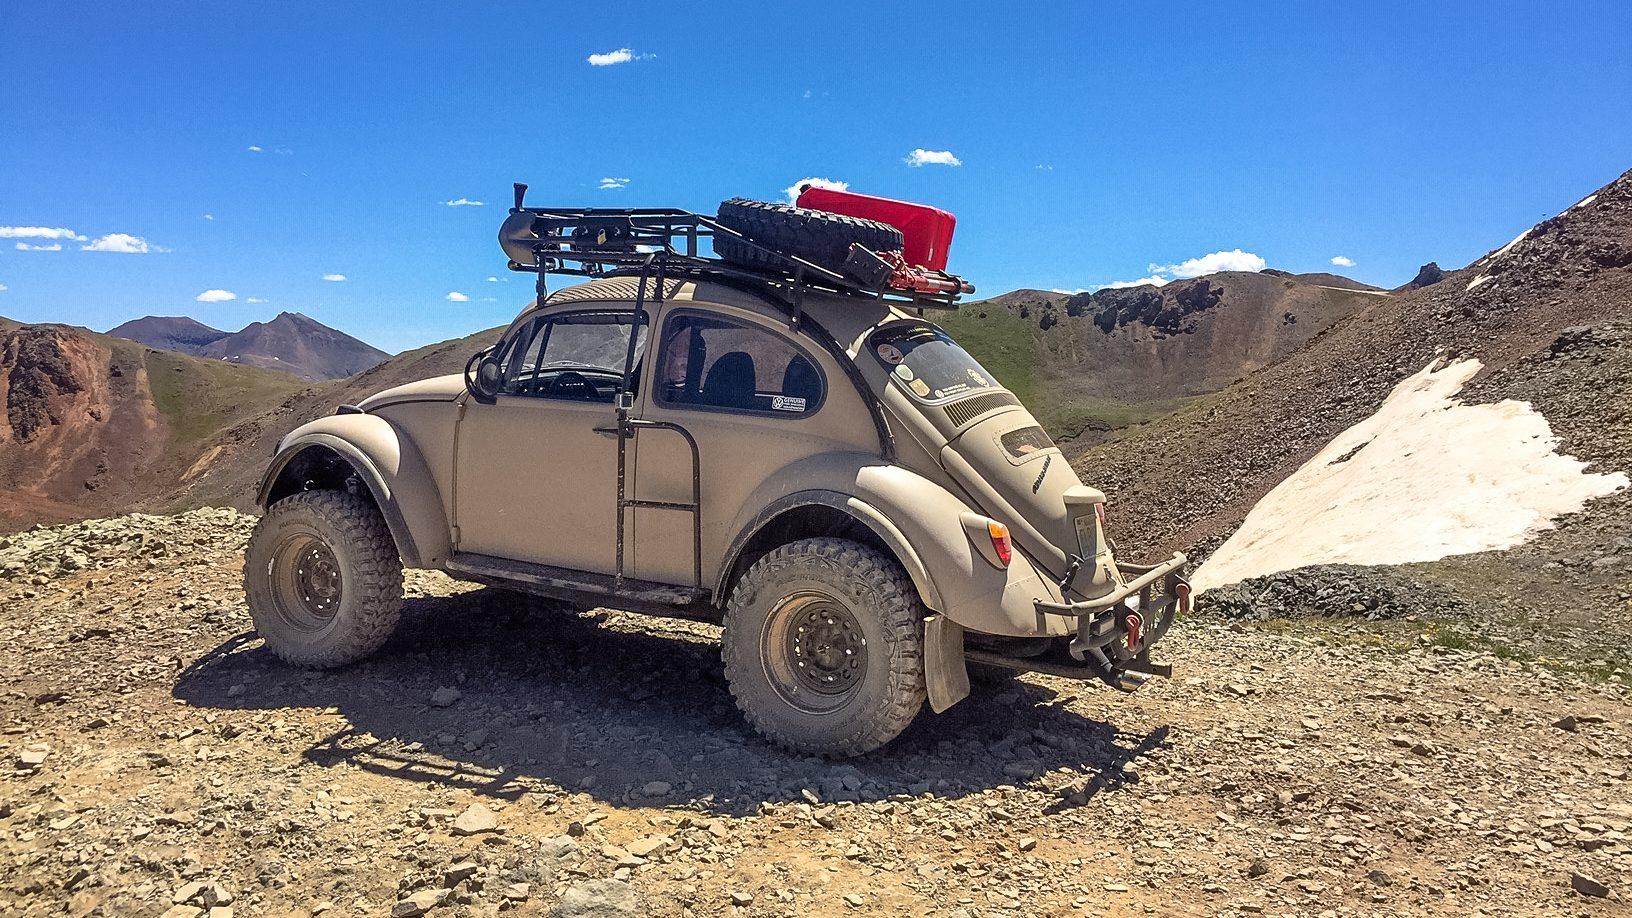 El Burro: The Overland Bug